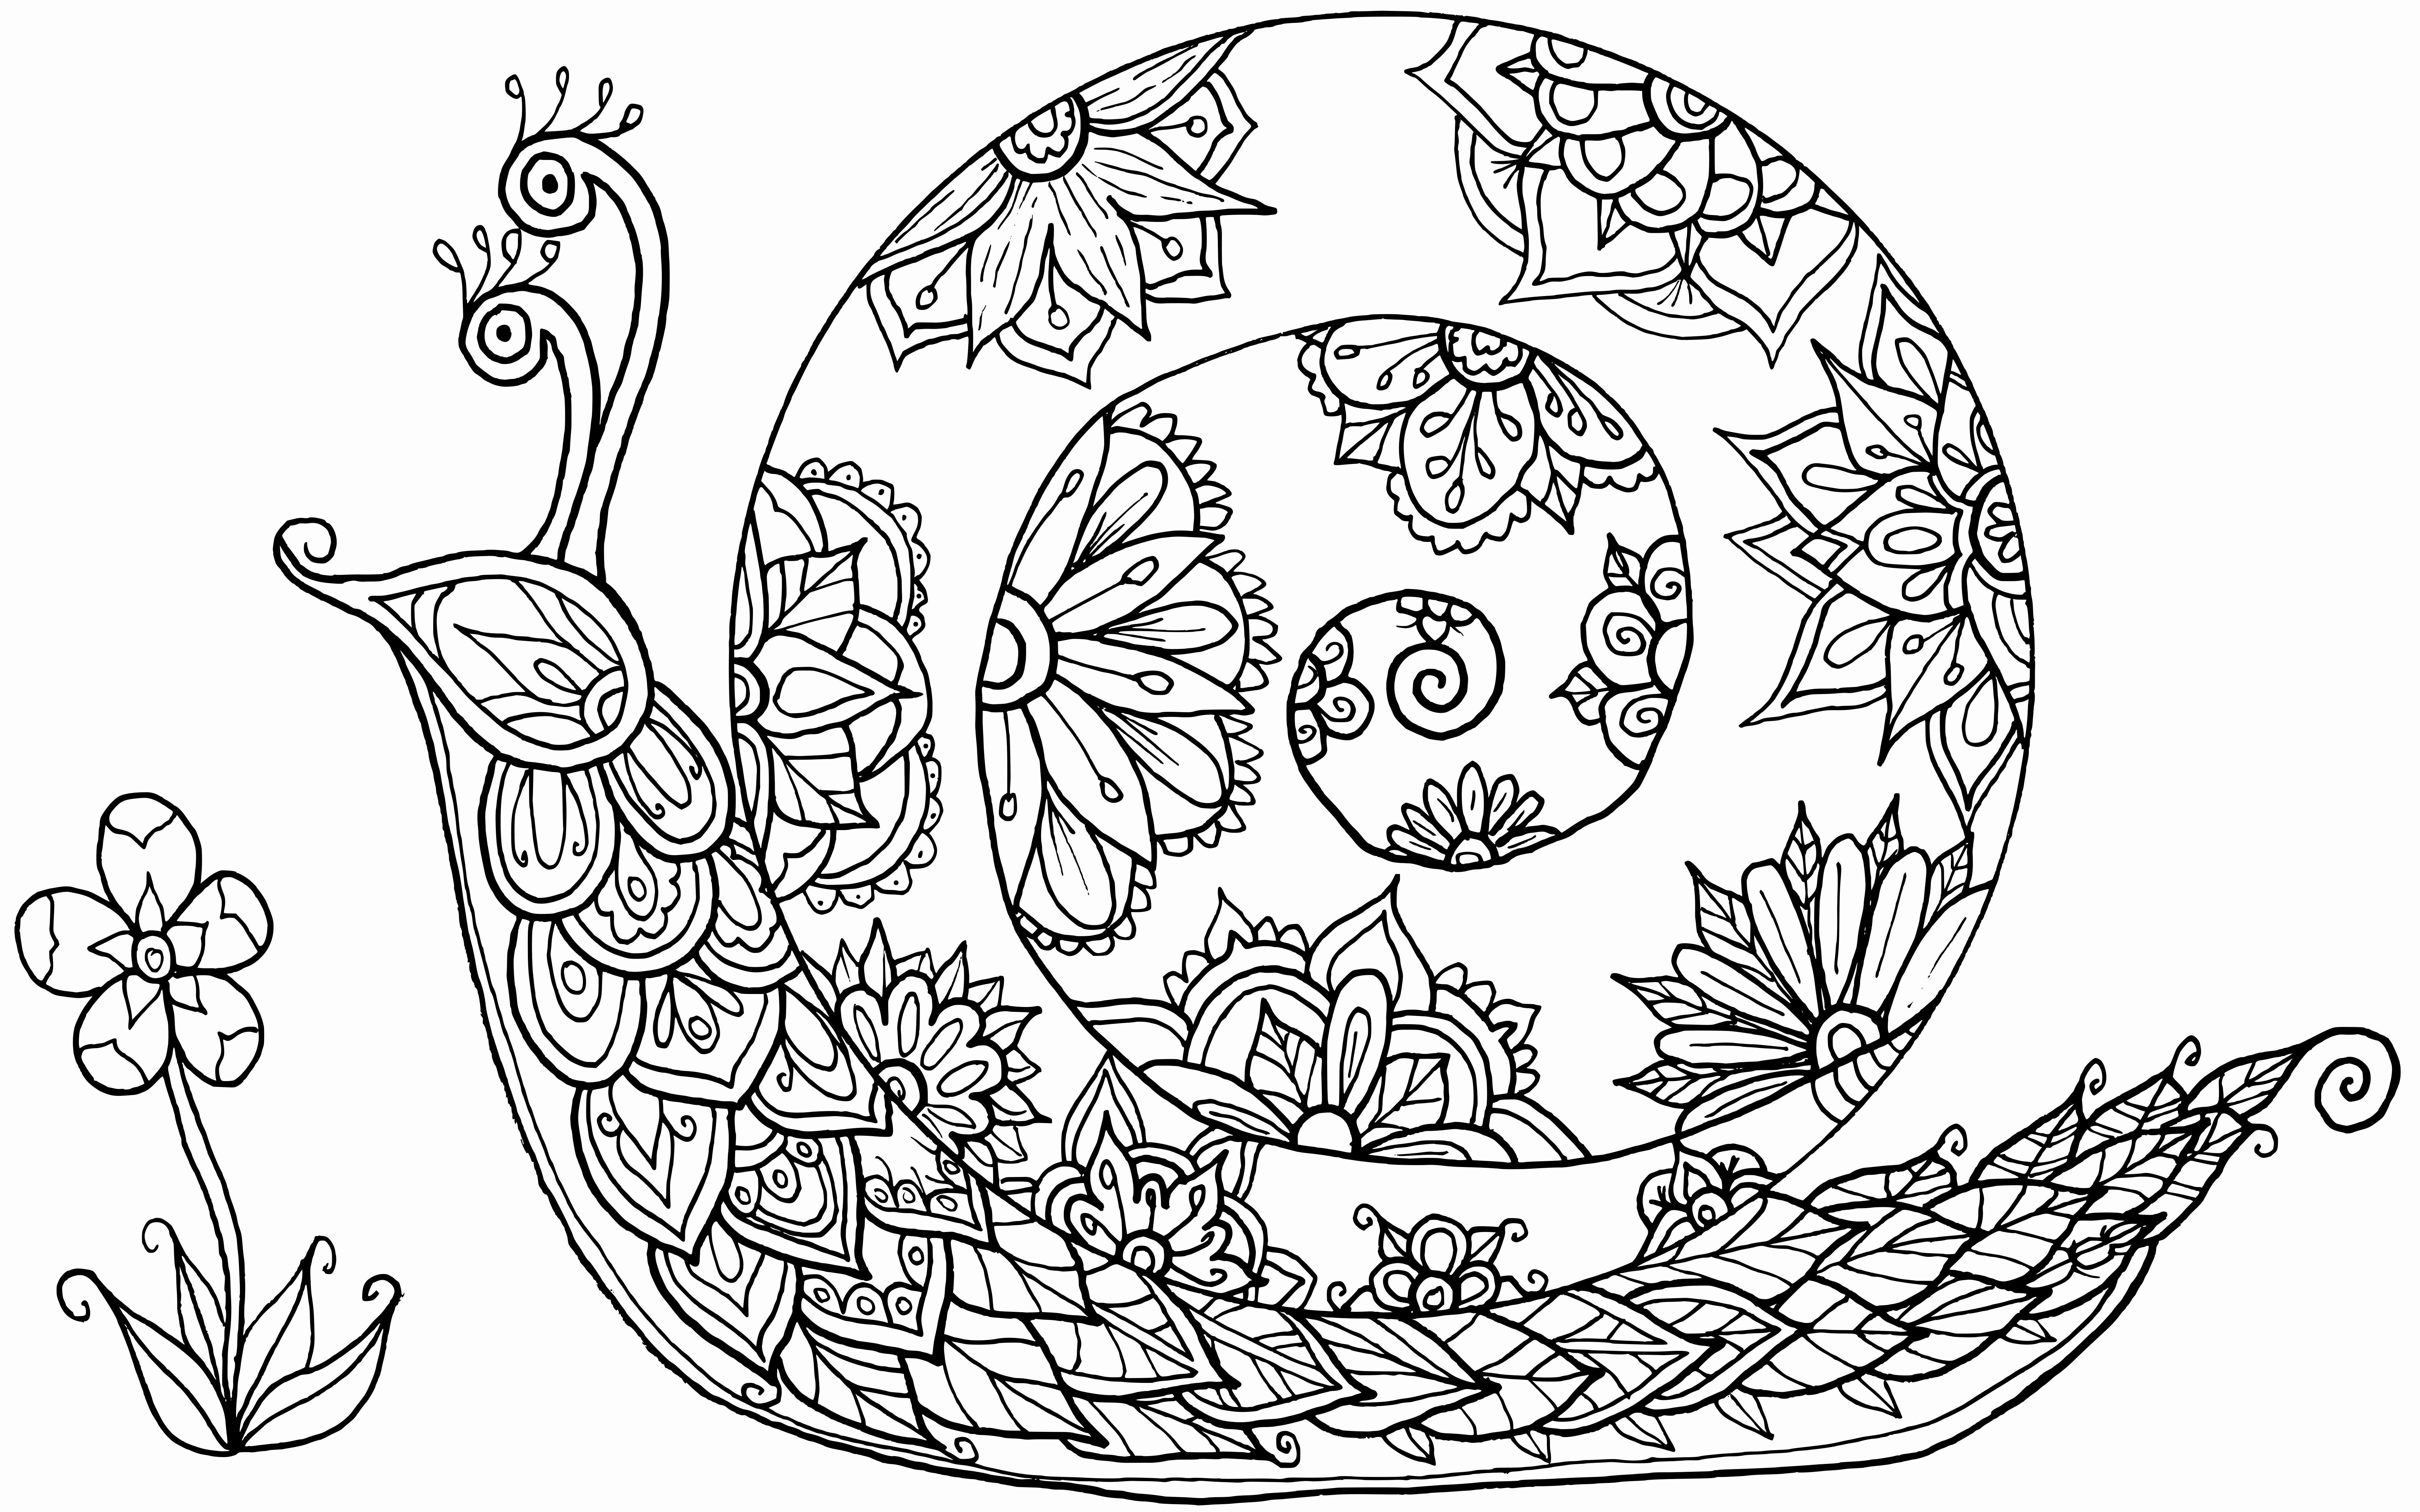 James Monroe Coloring Page Unique Snail Doodle By Del Angharad